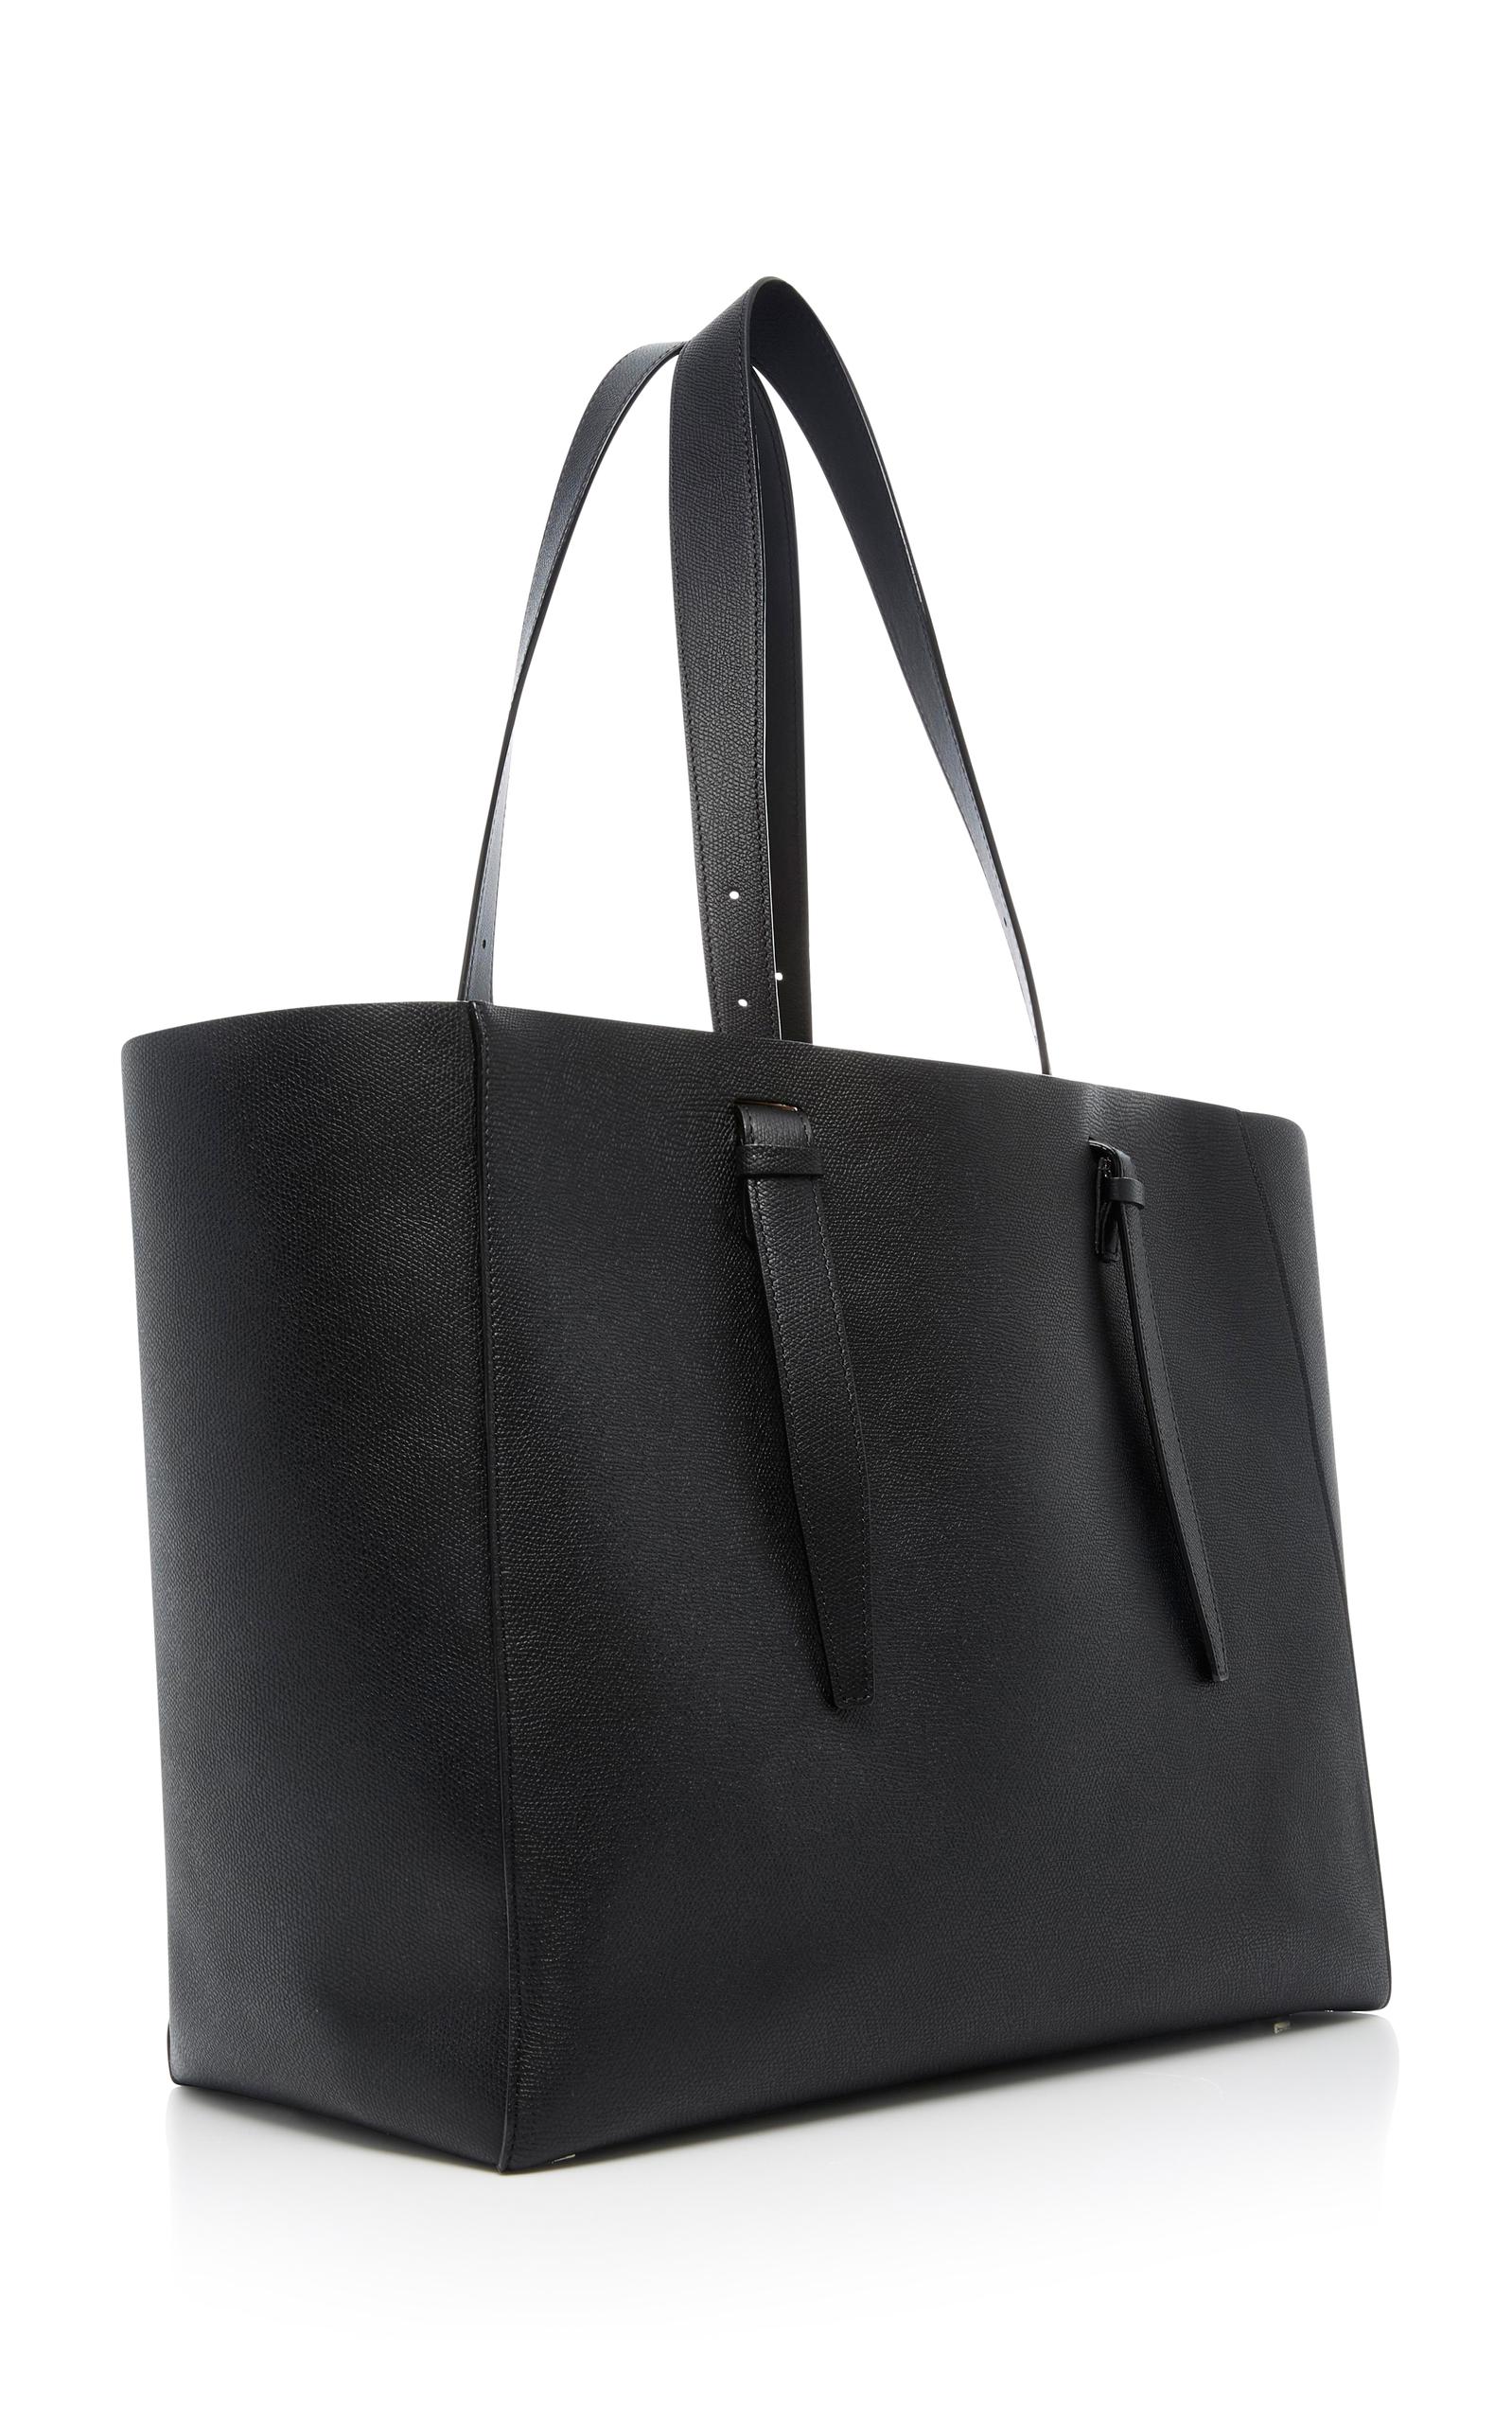 Valextra Soft XL Leather Tote EjrMHUUV